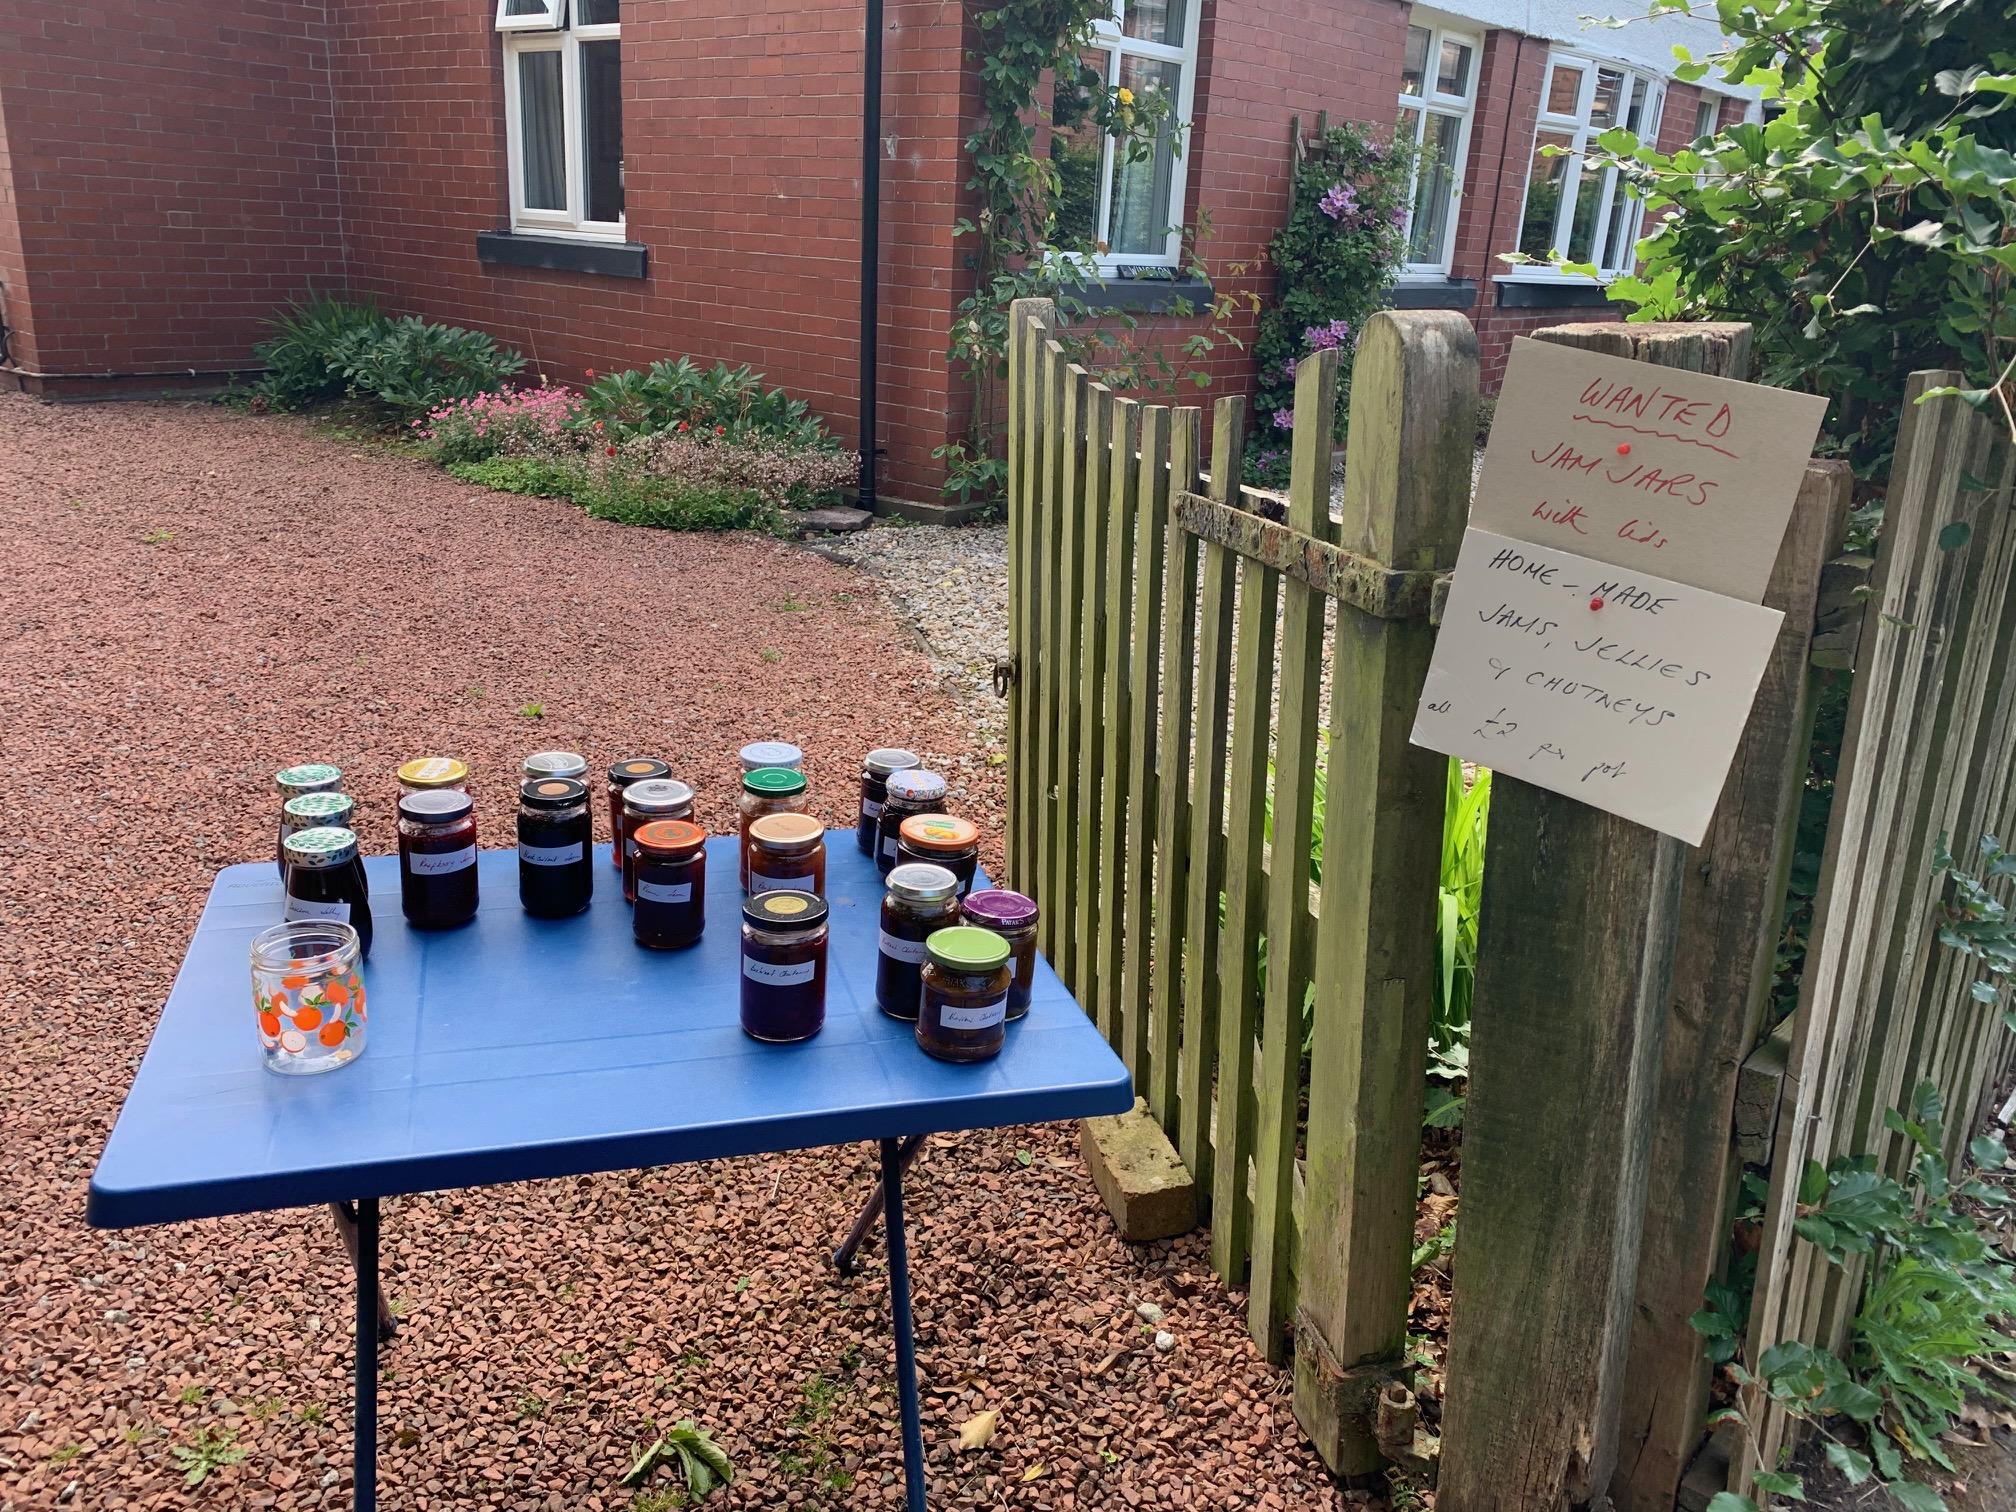 local residents selling homemade jam during lockdown